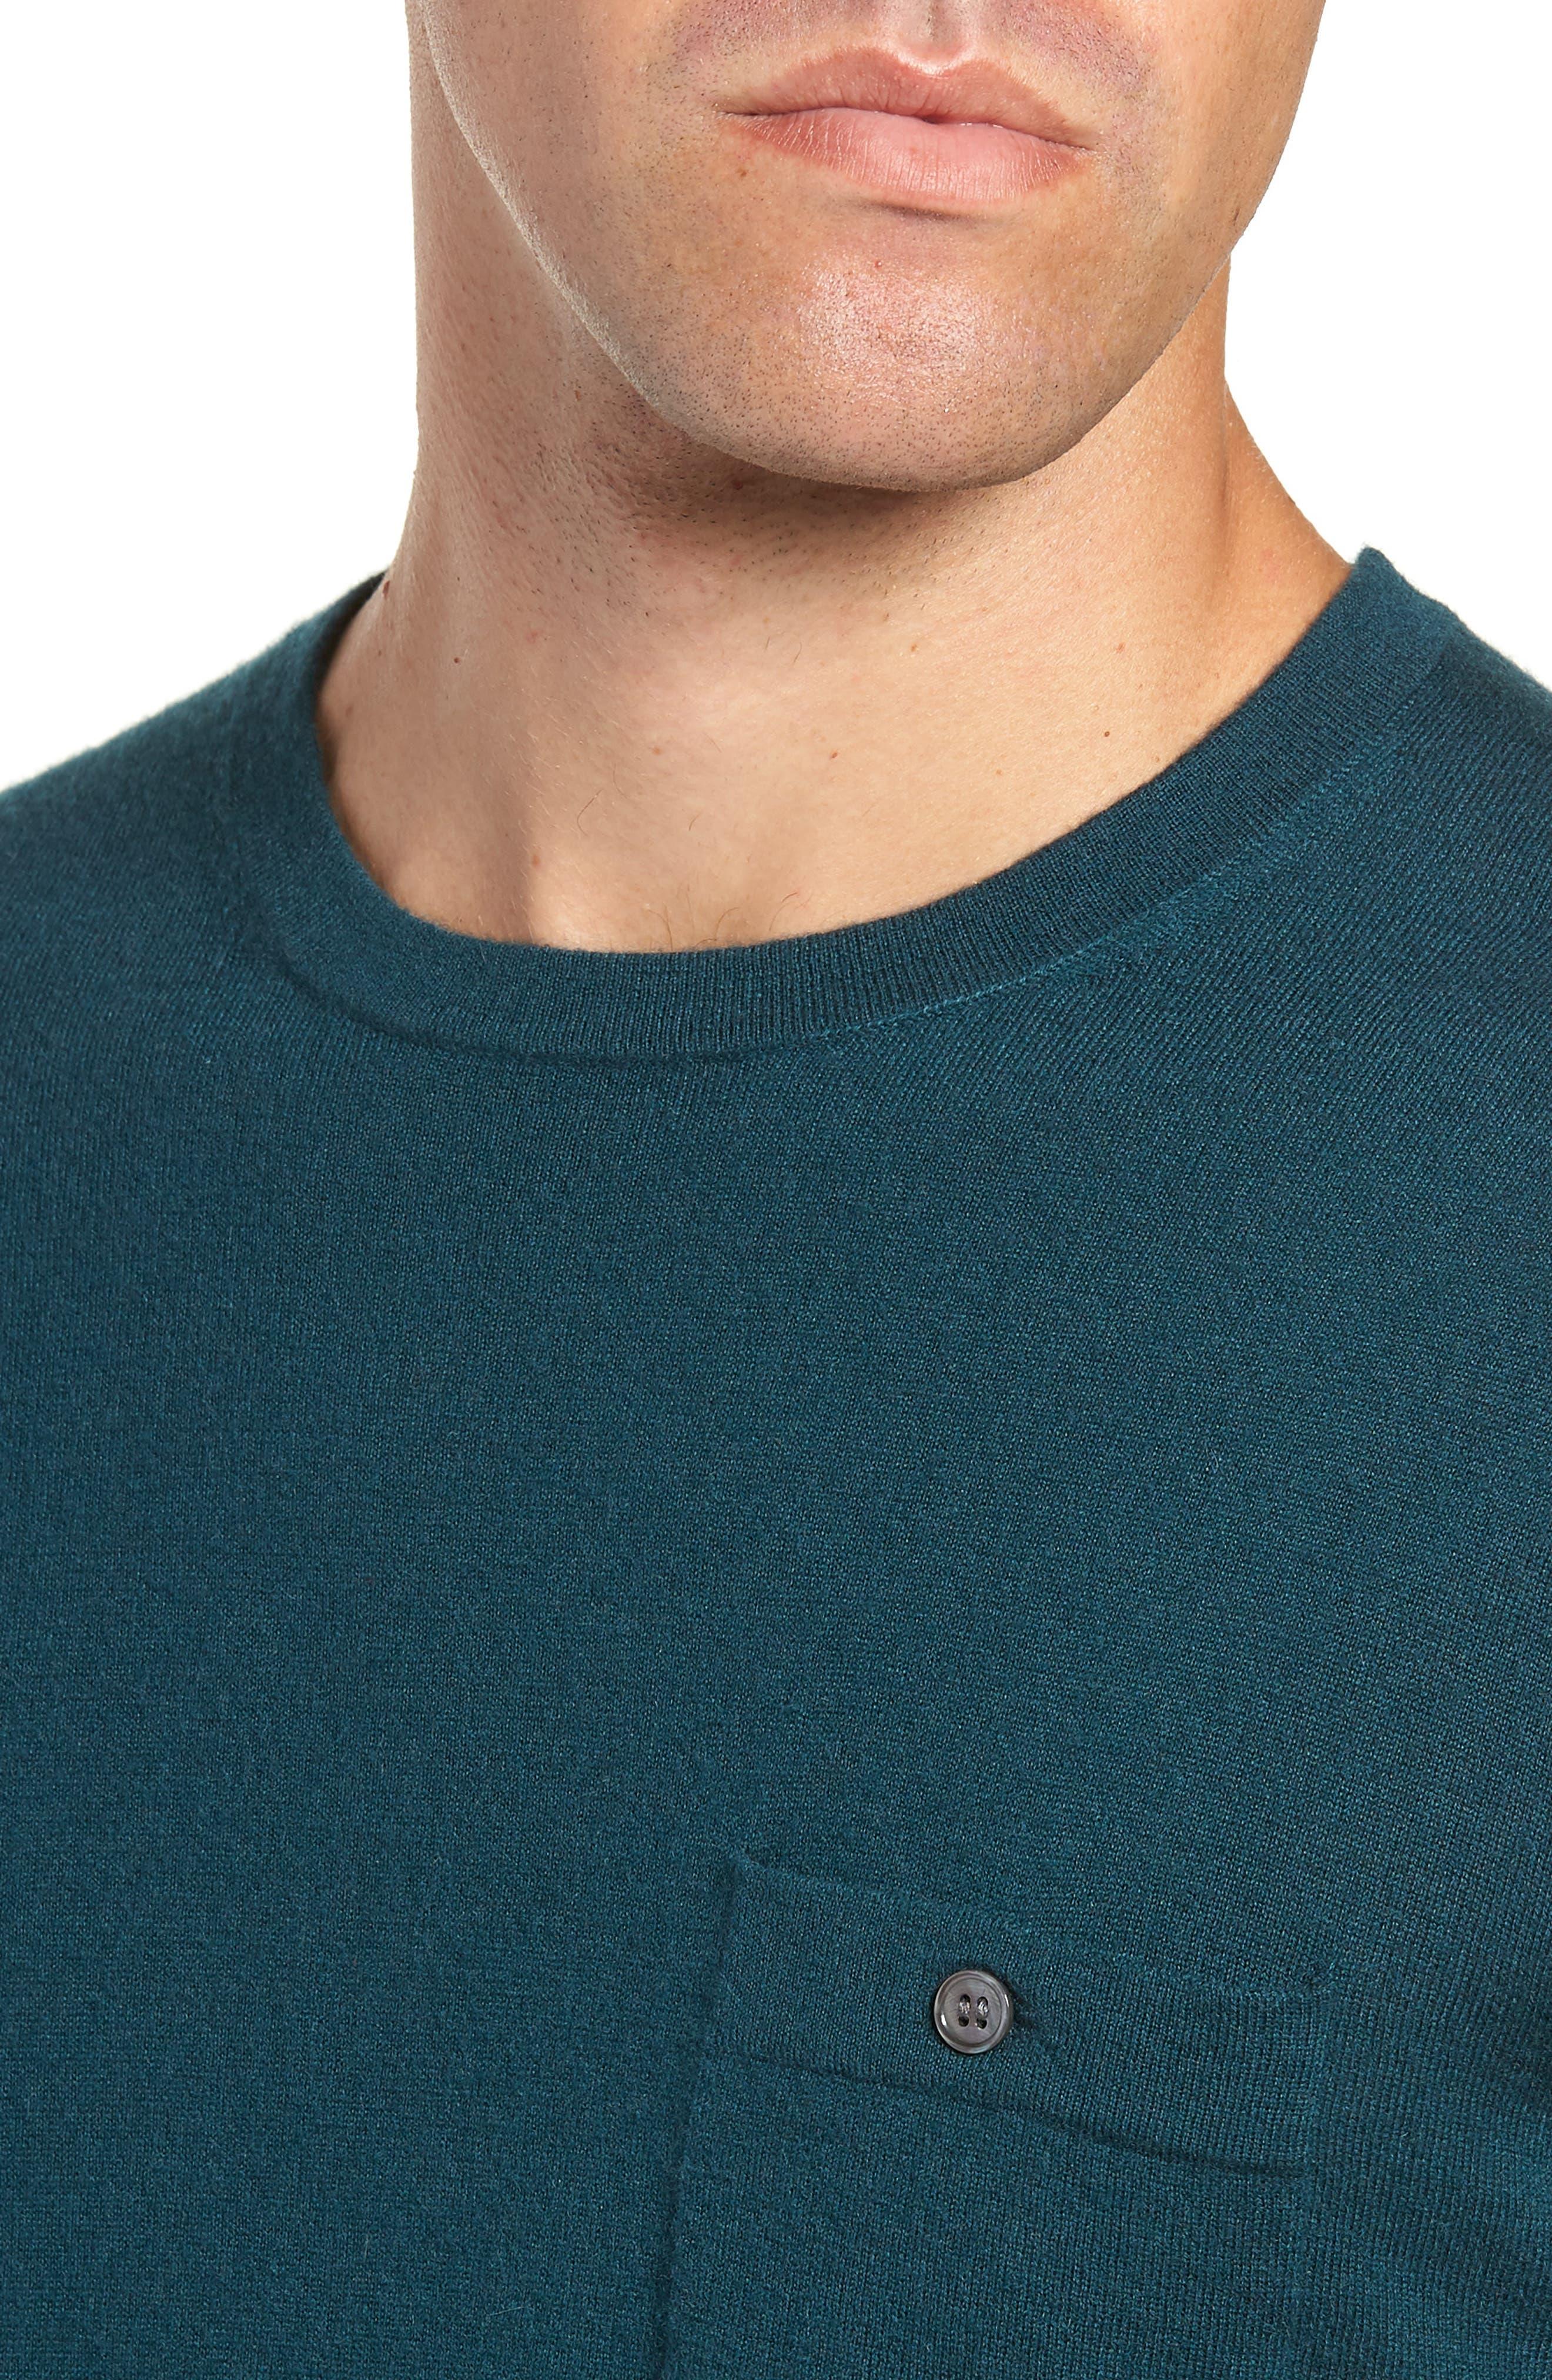 Cashmere Sweater,                             Alternate thumbnail 4, color,                             PETROL